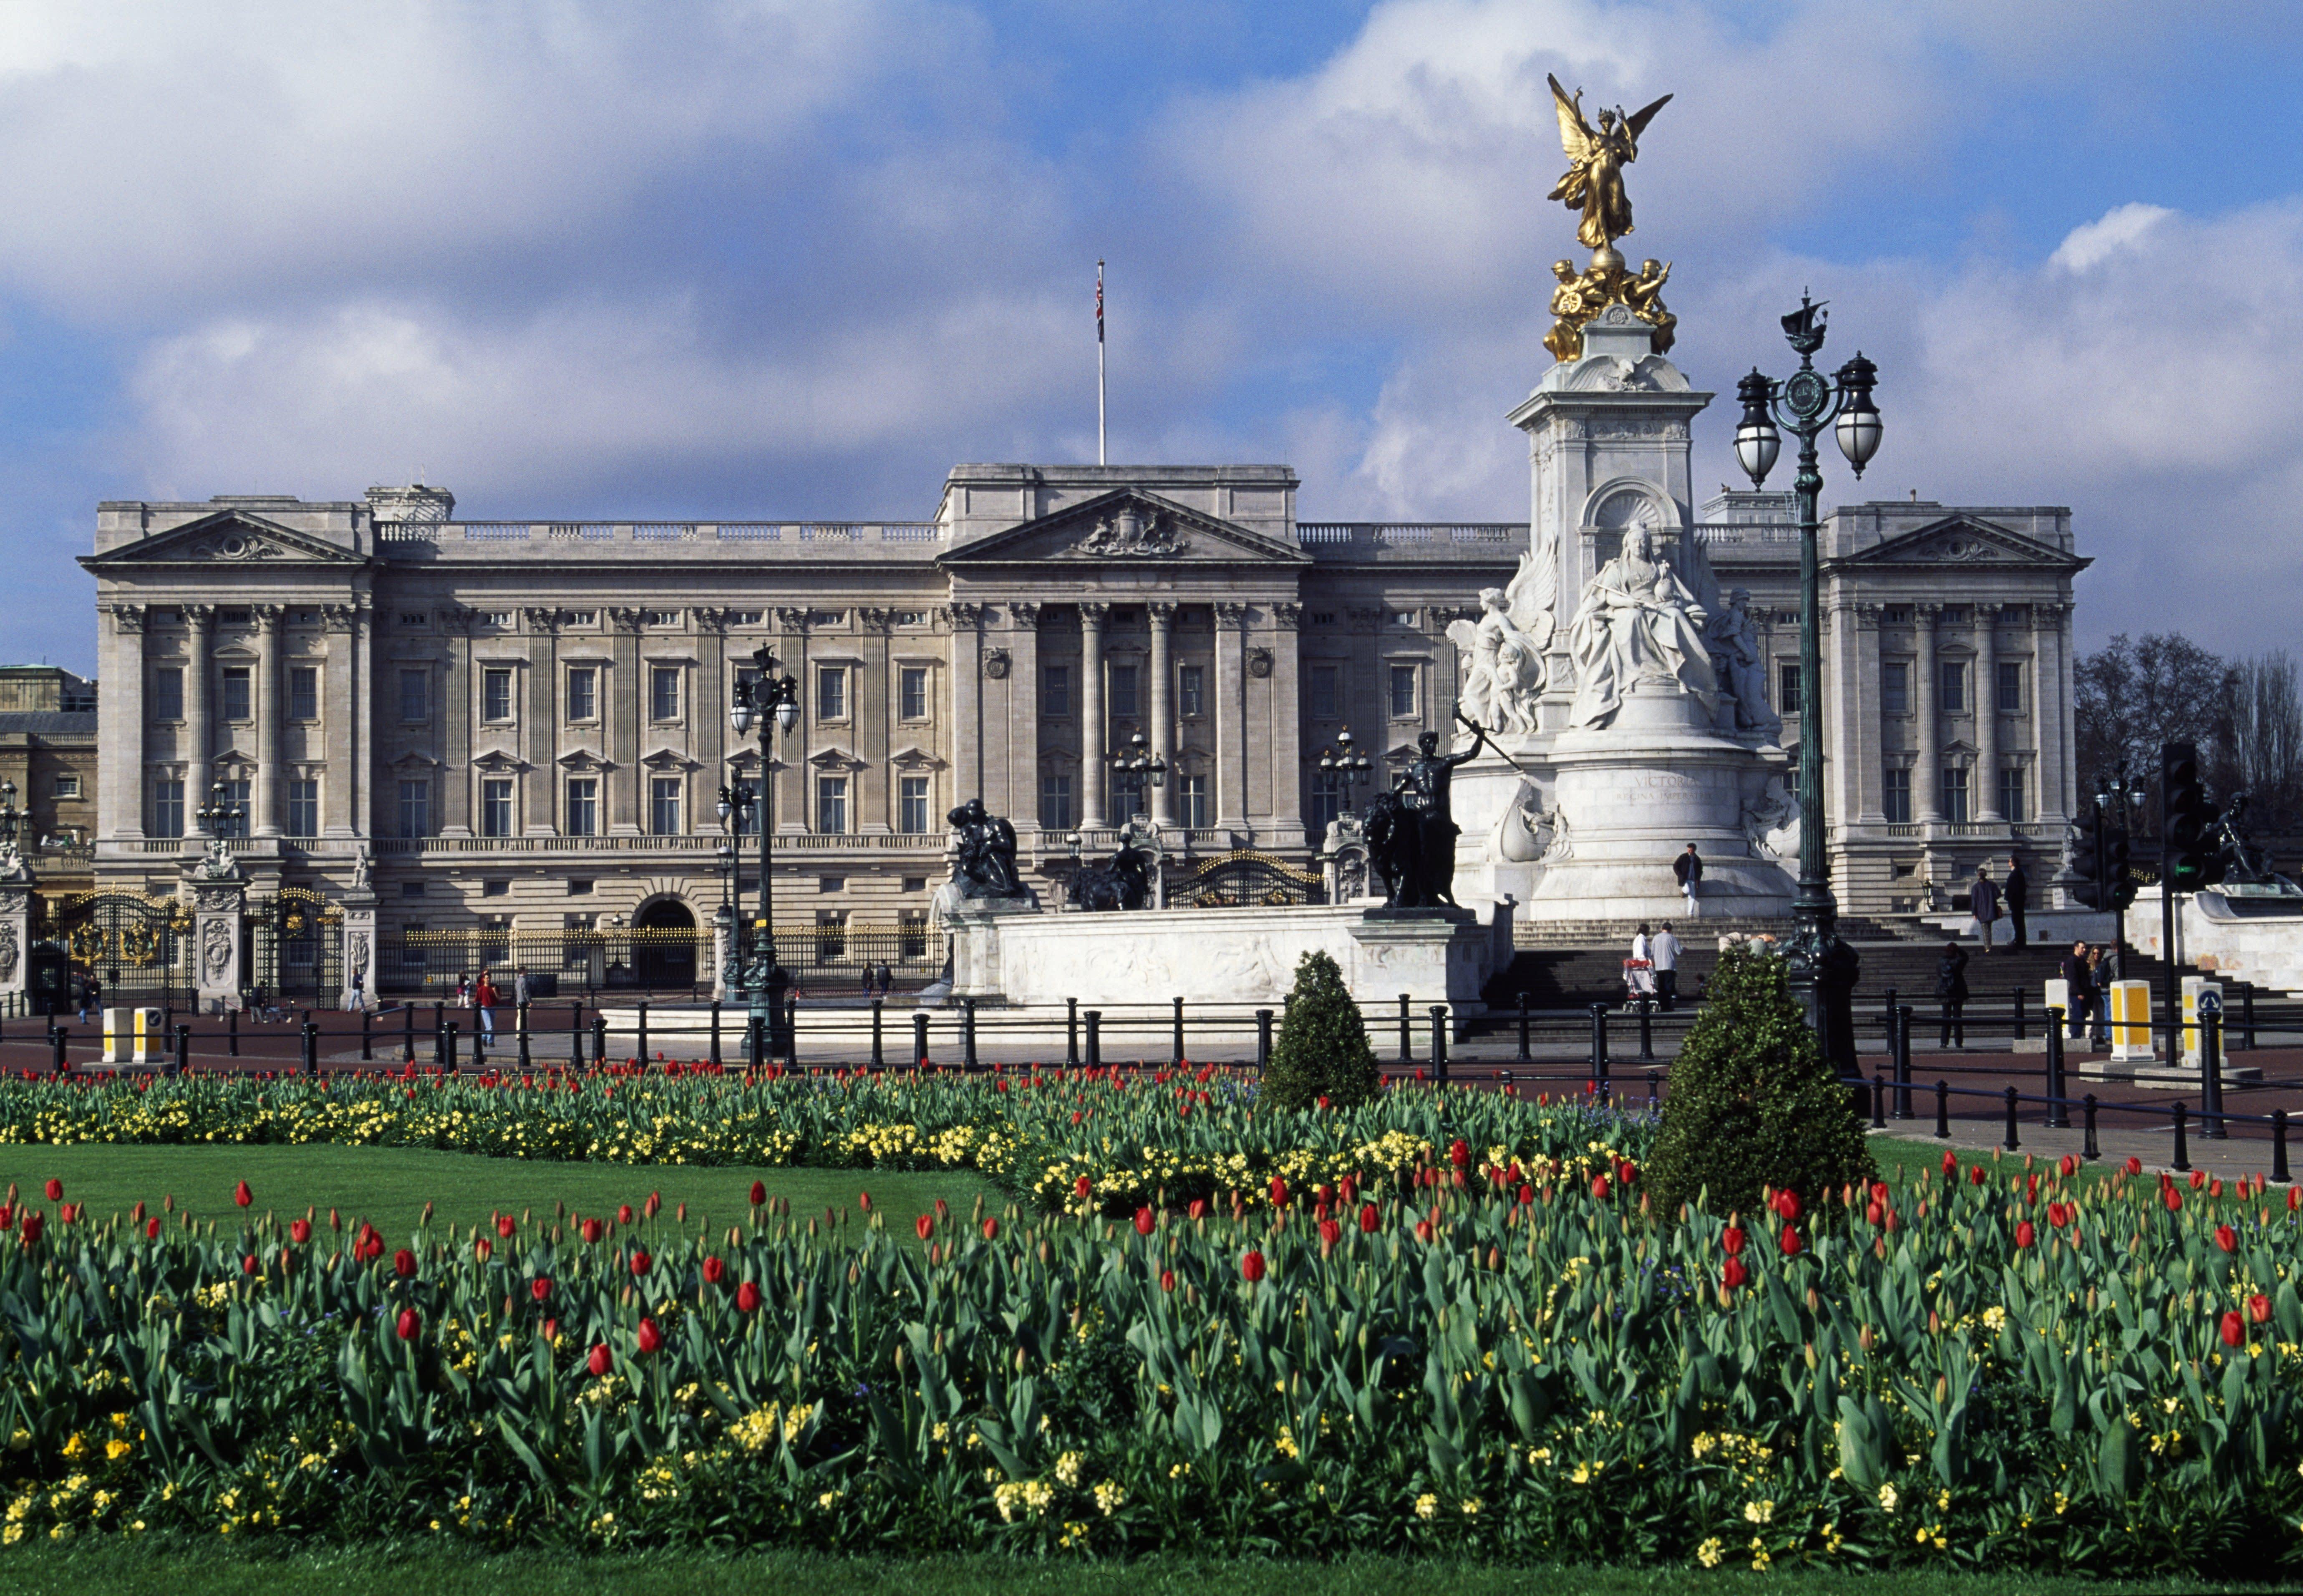 news from buckingham palace - HD5520×3825